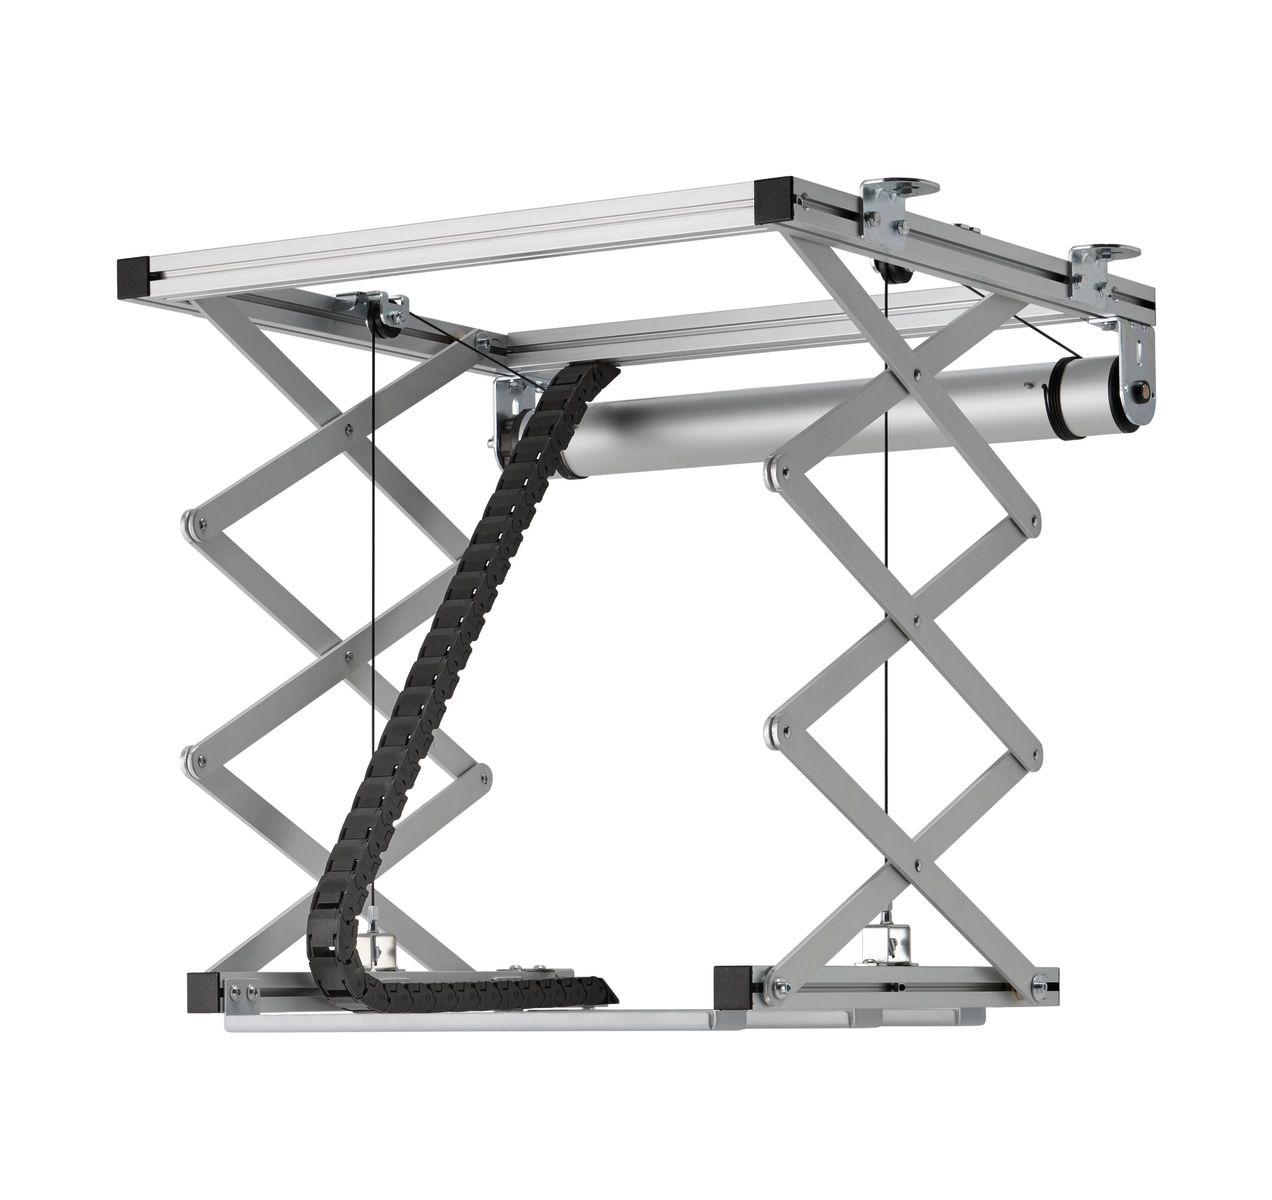 Vogels PPL2100 Projectr Ceiling Lift System 81.5cm